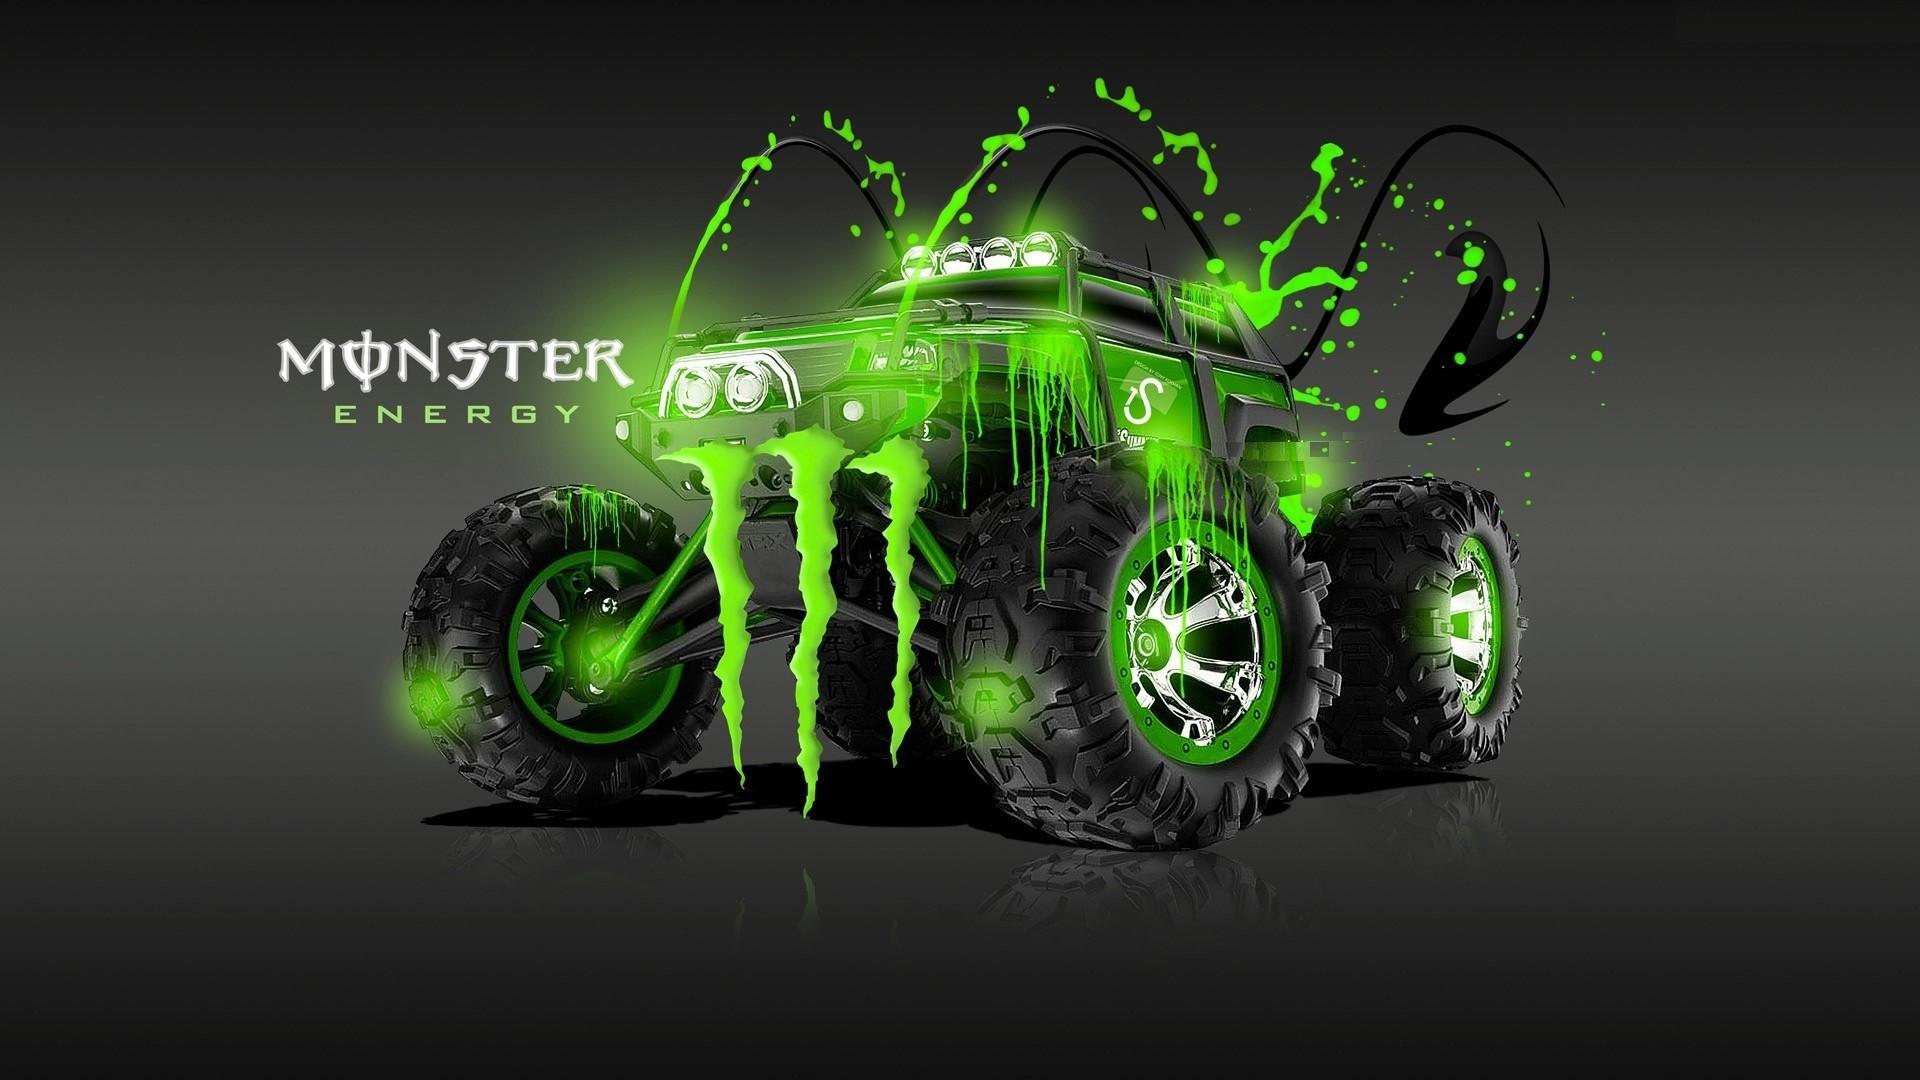 Monster energy drink wallpapers wallpapertag - Monster energy wallpaper download ...